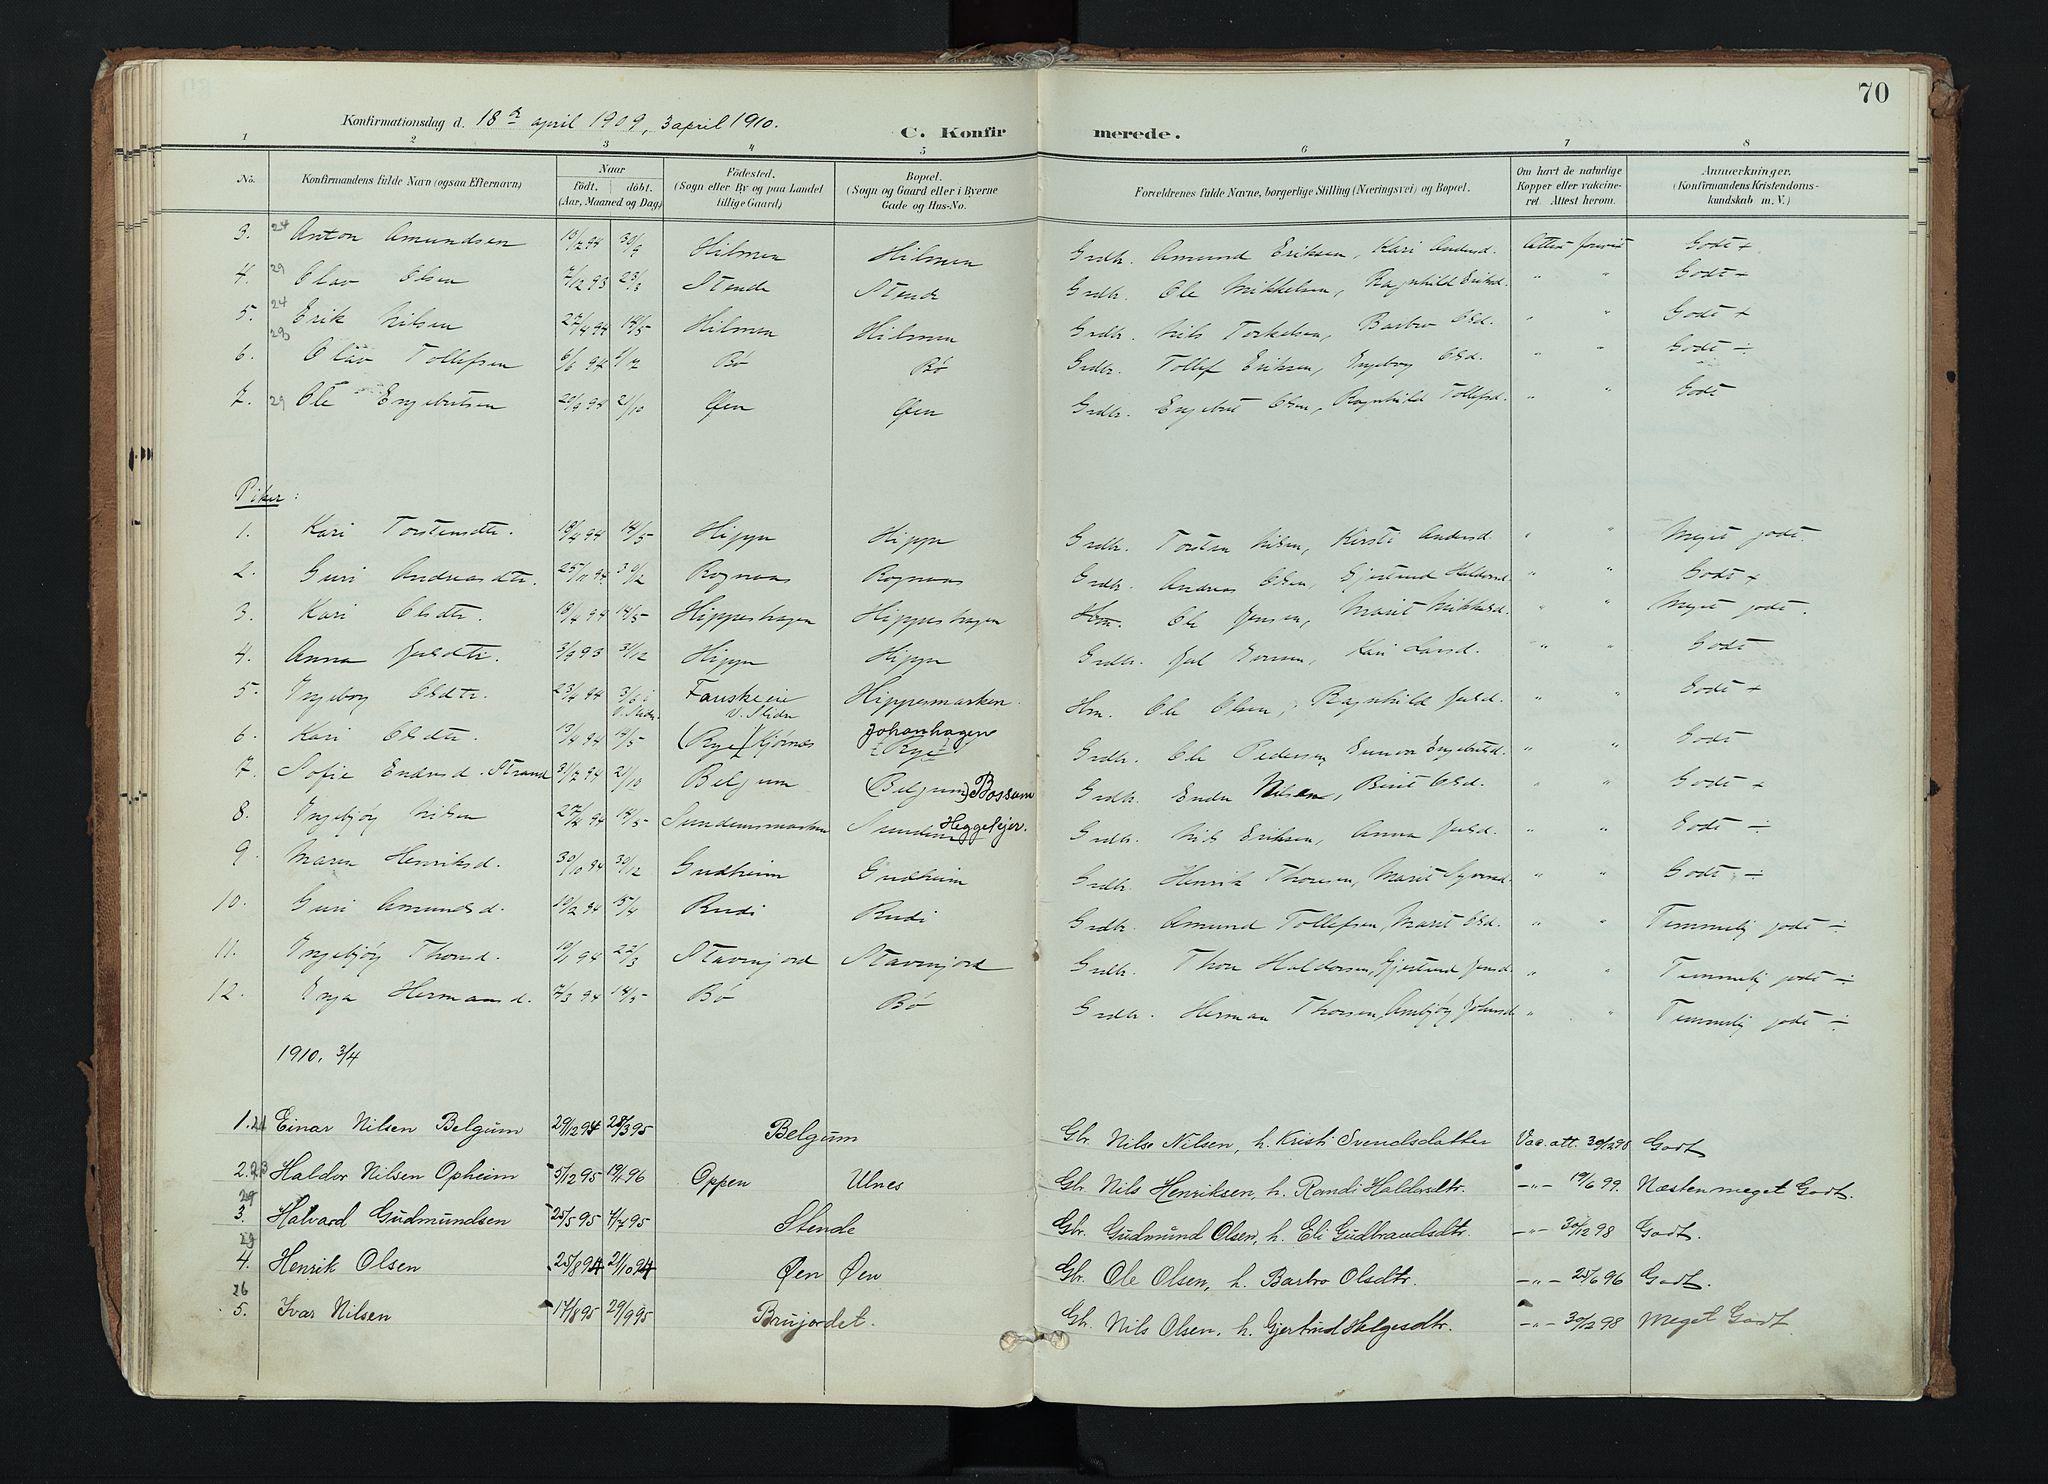 SAH, Nord-Aurdal prestekontor, Ministerialbok nr. 17, 1897-1926, s. 70